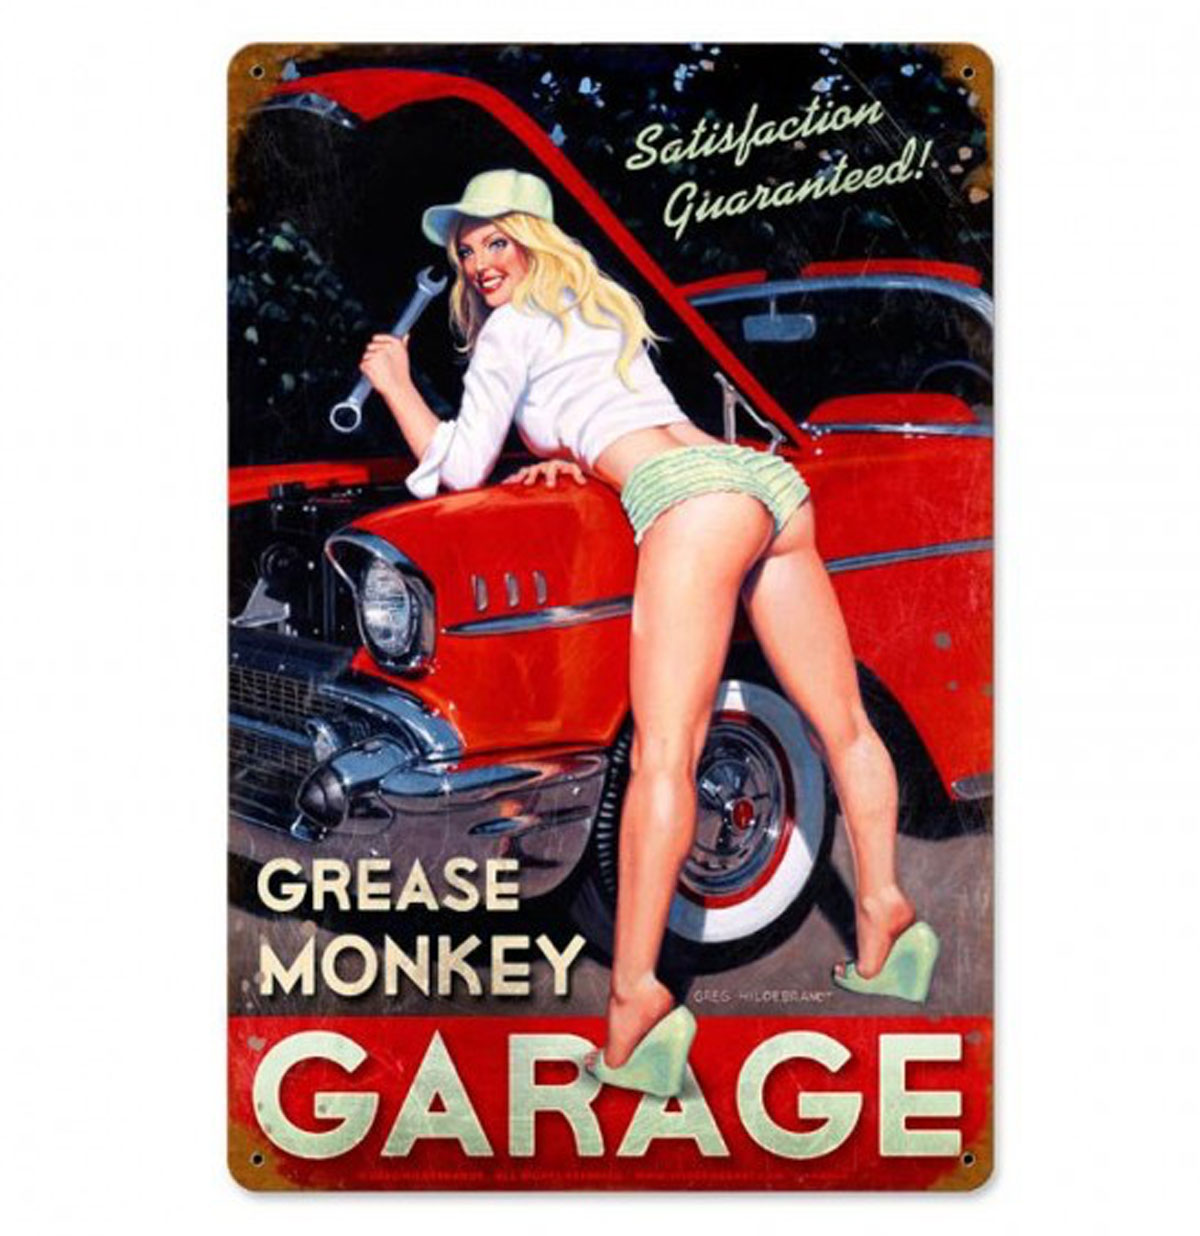 Grease Monkey Garage Pin-Up Zwaar Metalen Bord - Greg Hildebrandt